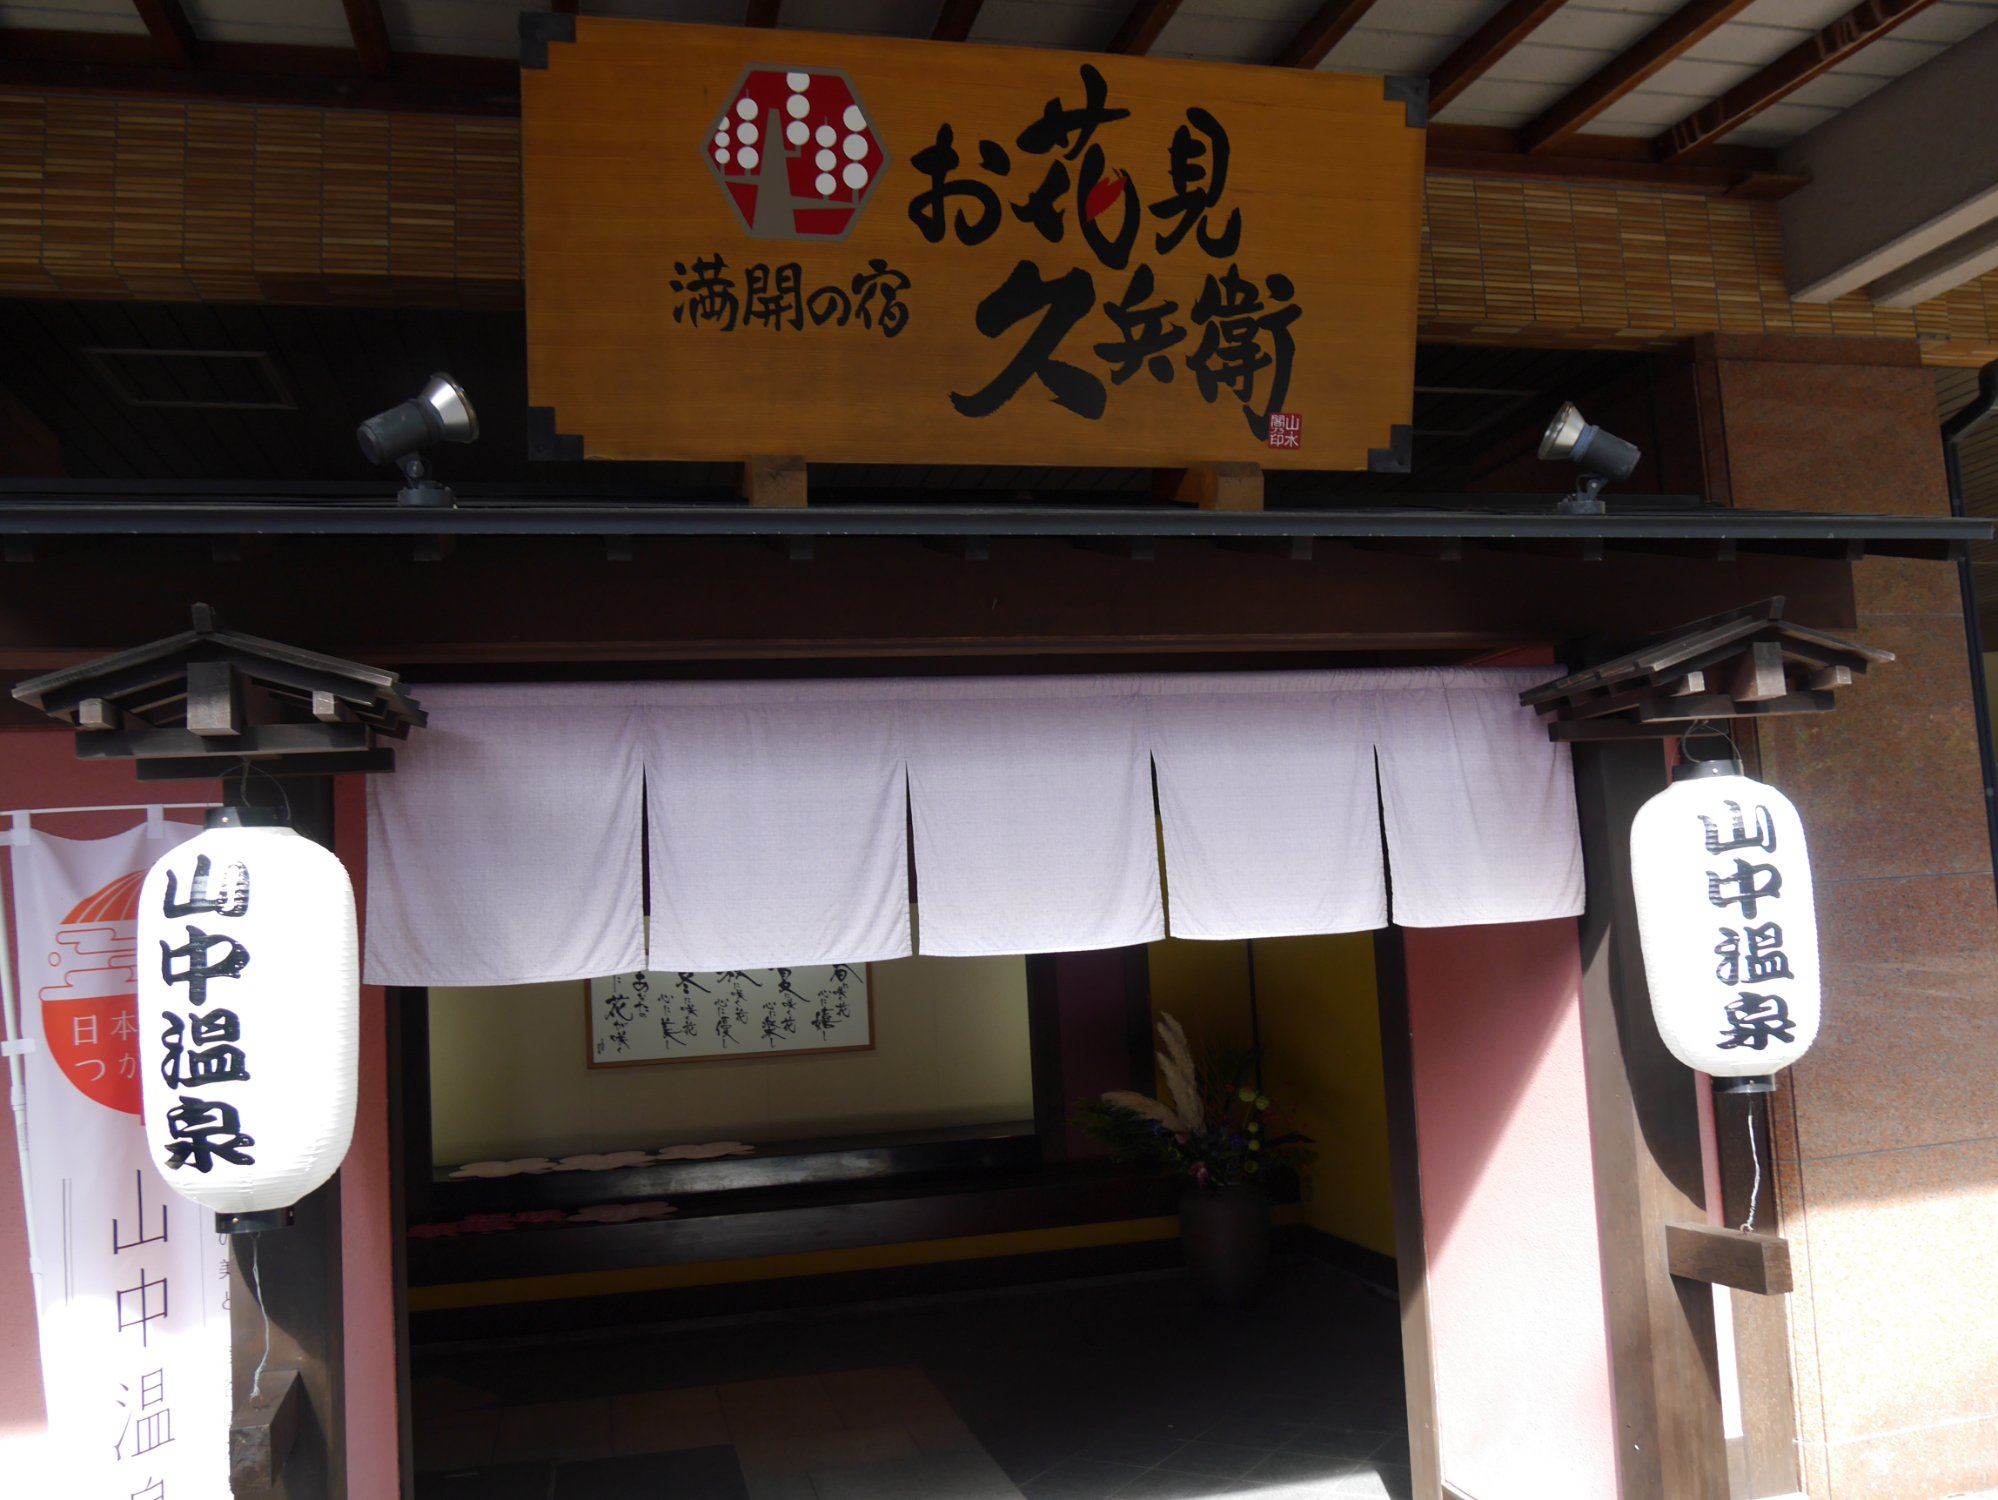 Ohanami Kyubei